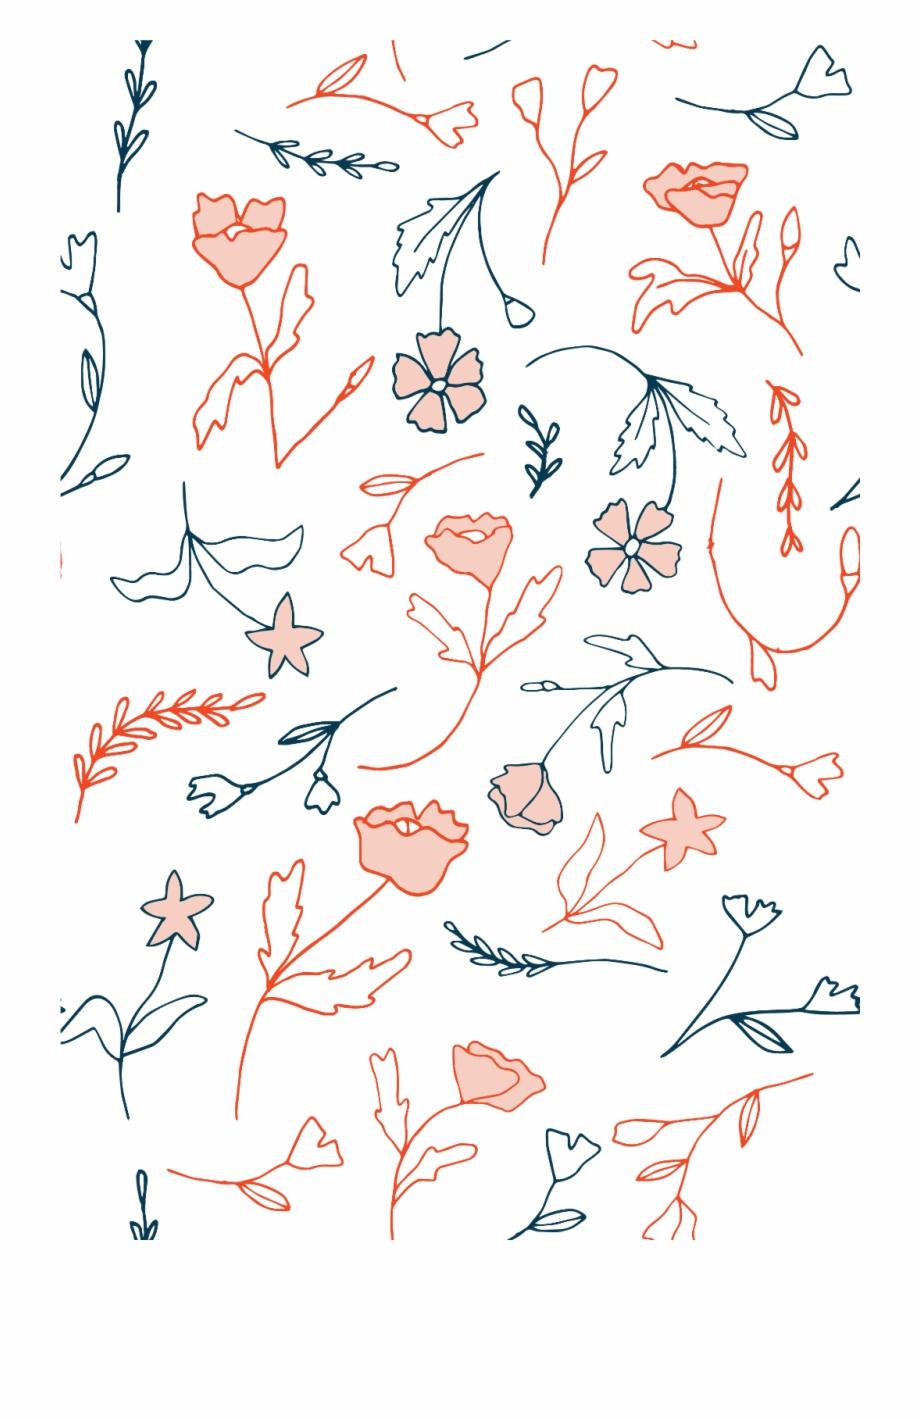 Background Wallpaper Floral Flower Vector Iphone Transparent Png Download 4630488 Vippng